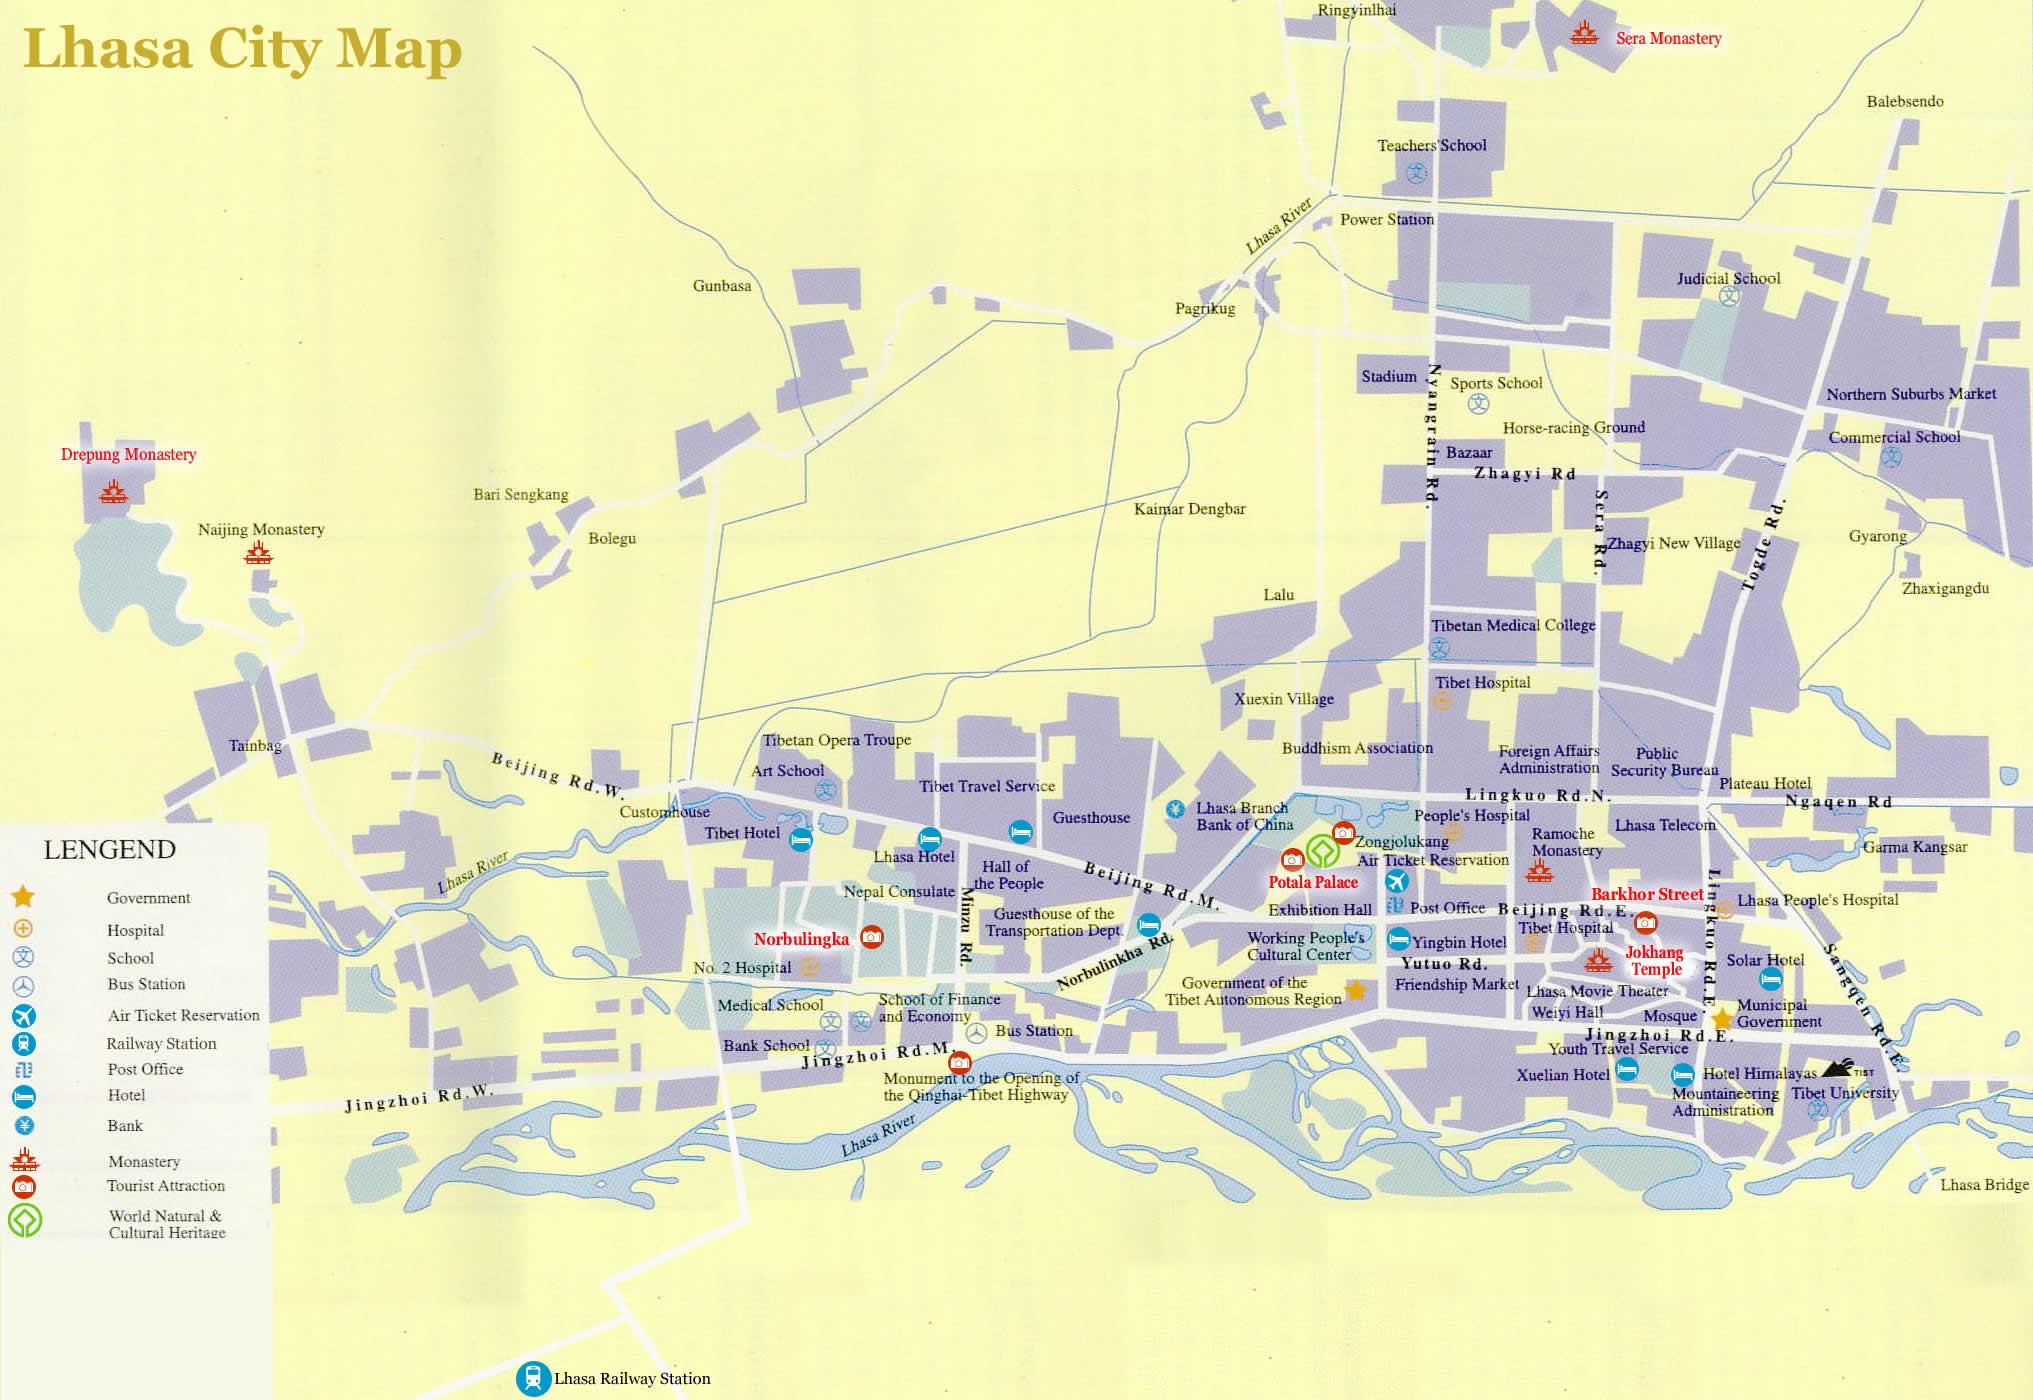 Lhasa City Map 2017 2018 Map Of Lhasa City Lhasa Map